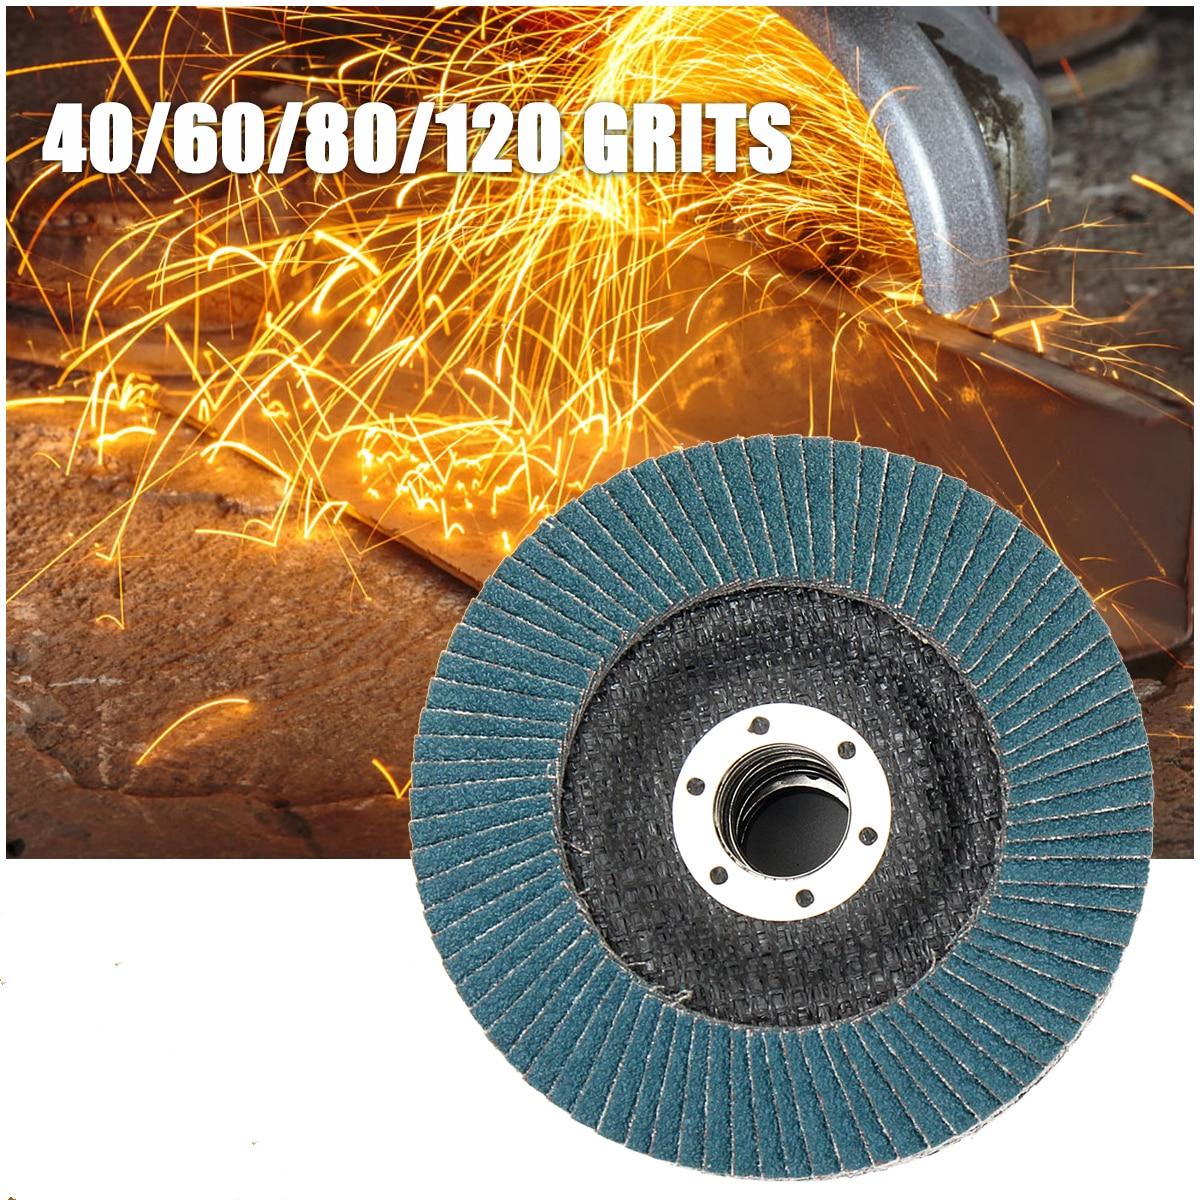 Flap Sanding Disc 115mm 40/60/80/120 Grits Round Sandpaper Sanding Paper Discs 4.5 Inches Grinding Wheels Flap Discs